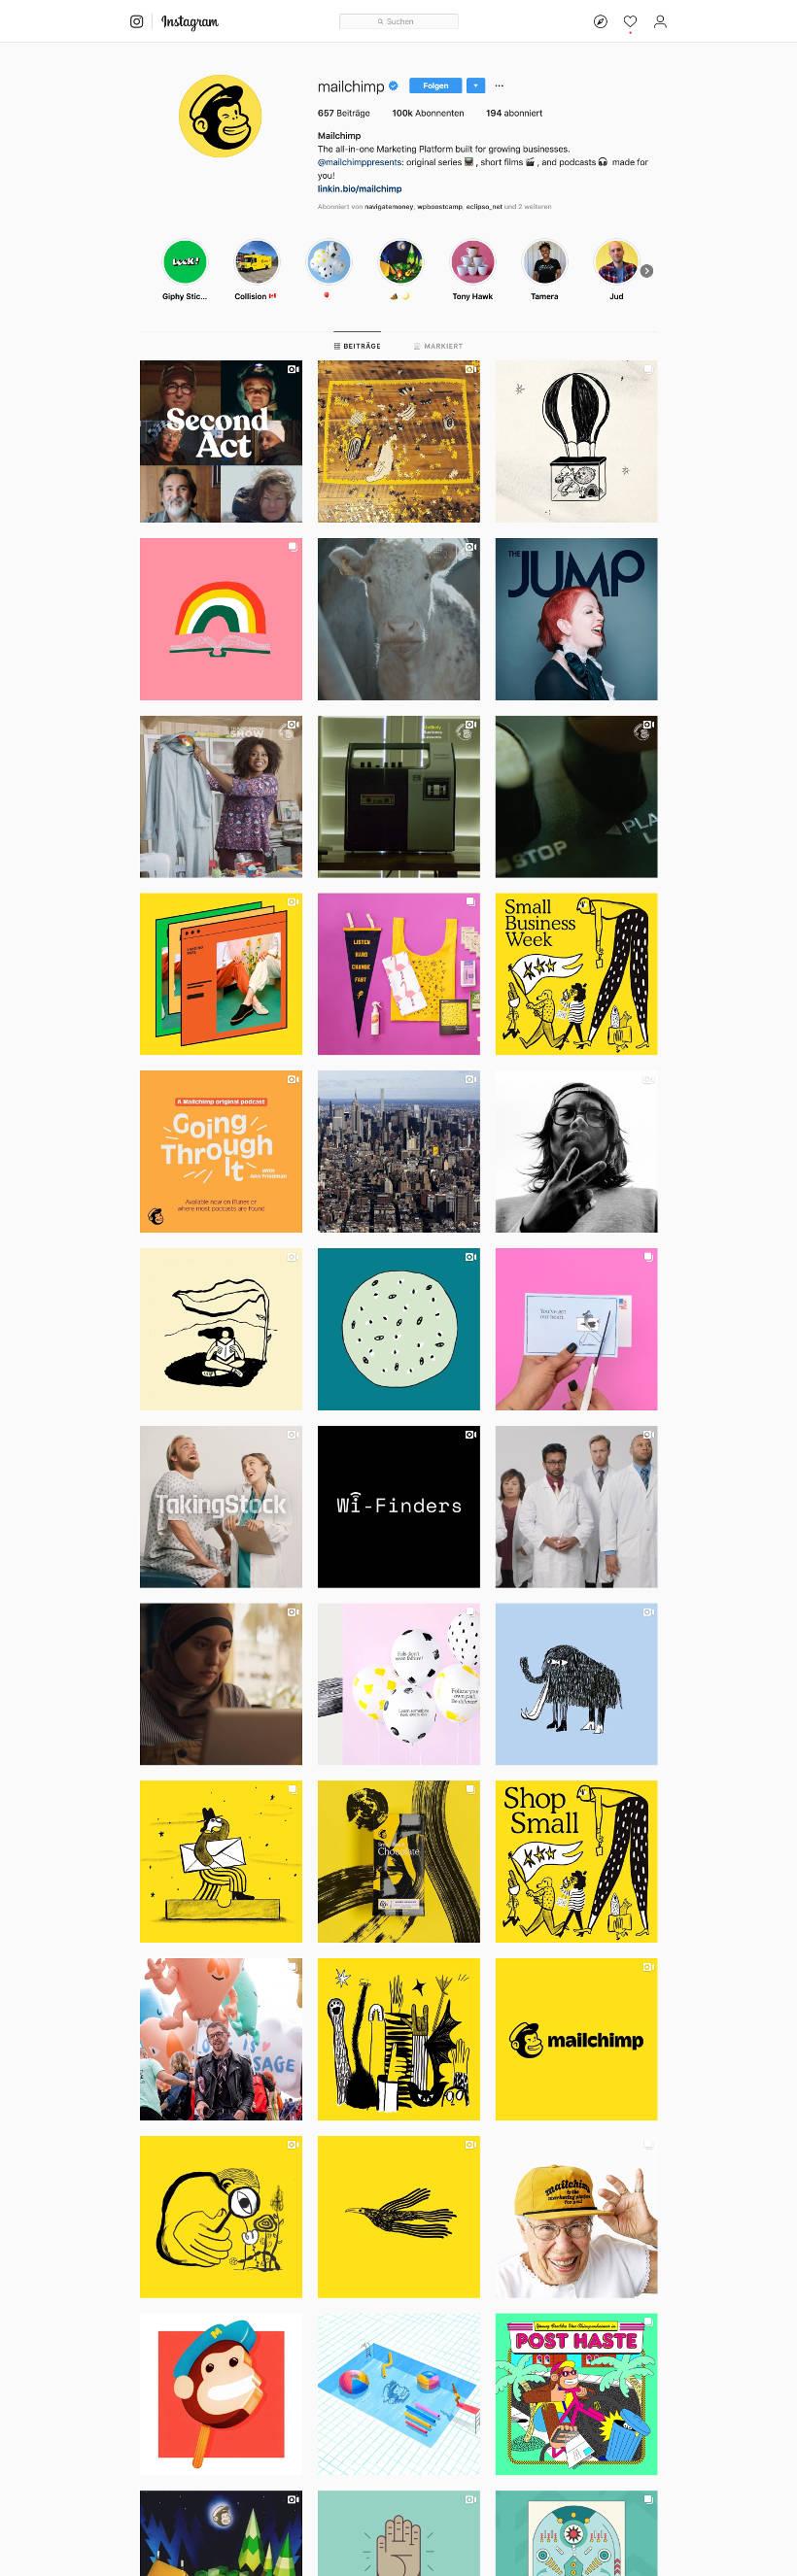 Mailchimp Instagram Screenshot